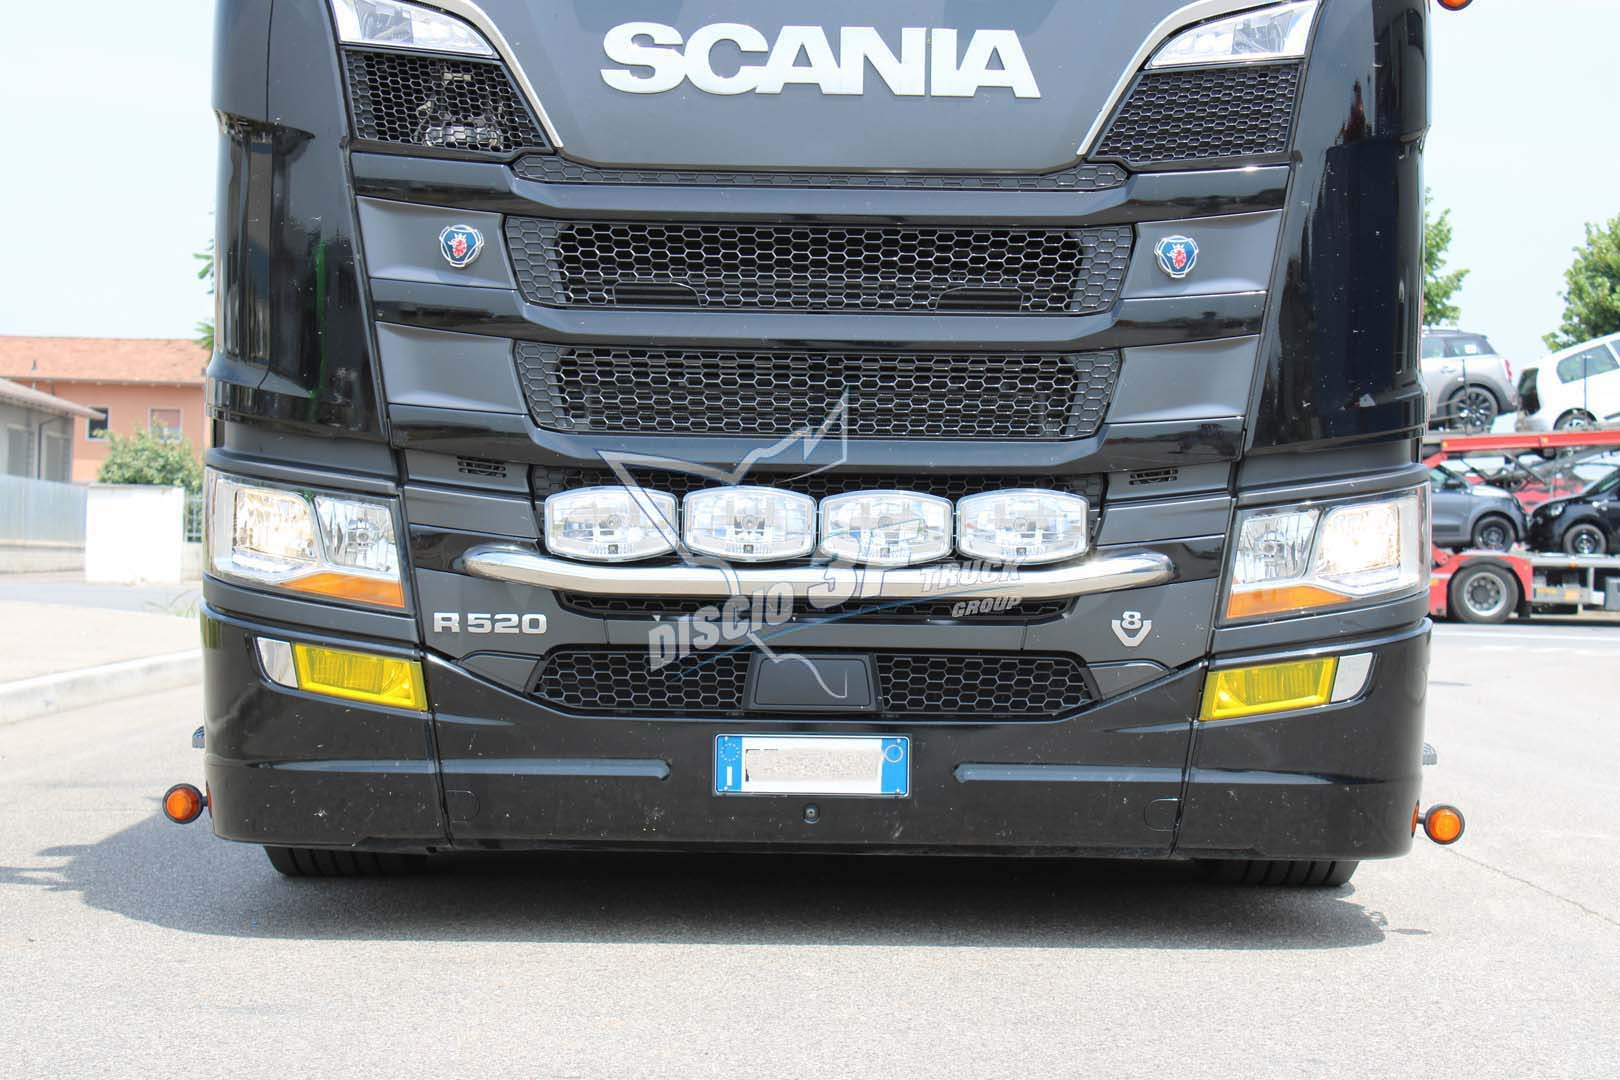 Palo Mascherina, Scania N/G